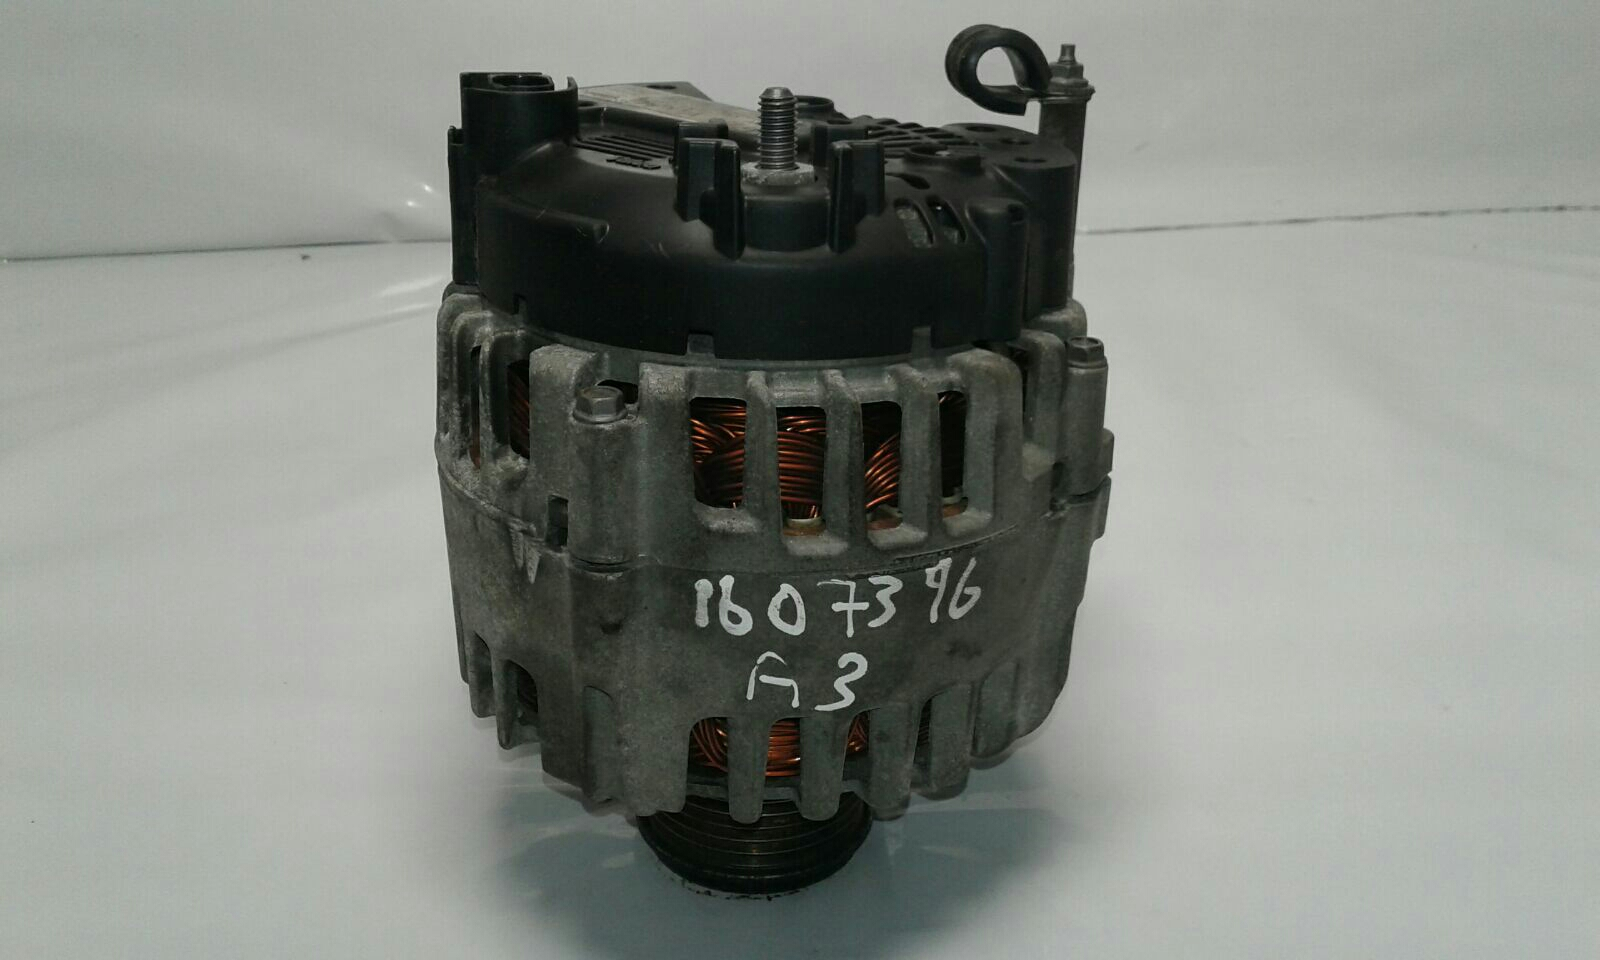 audi a3 2008 to 2013 alternator diesel manual for sale from rh motorhog co uk Audi A3 Manual PDF Audi A3 Sportback